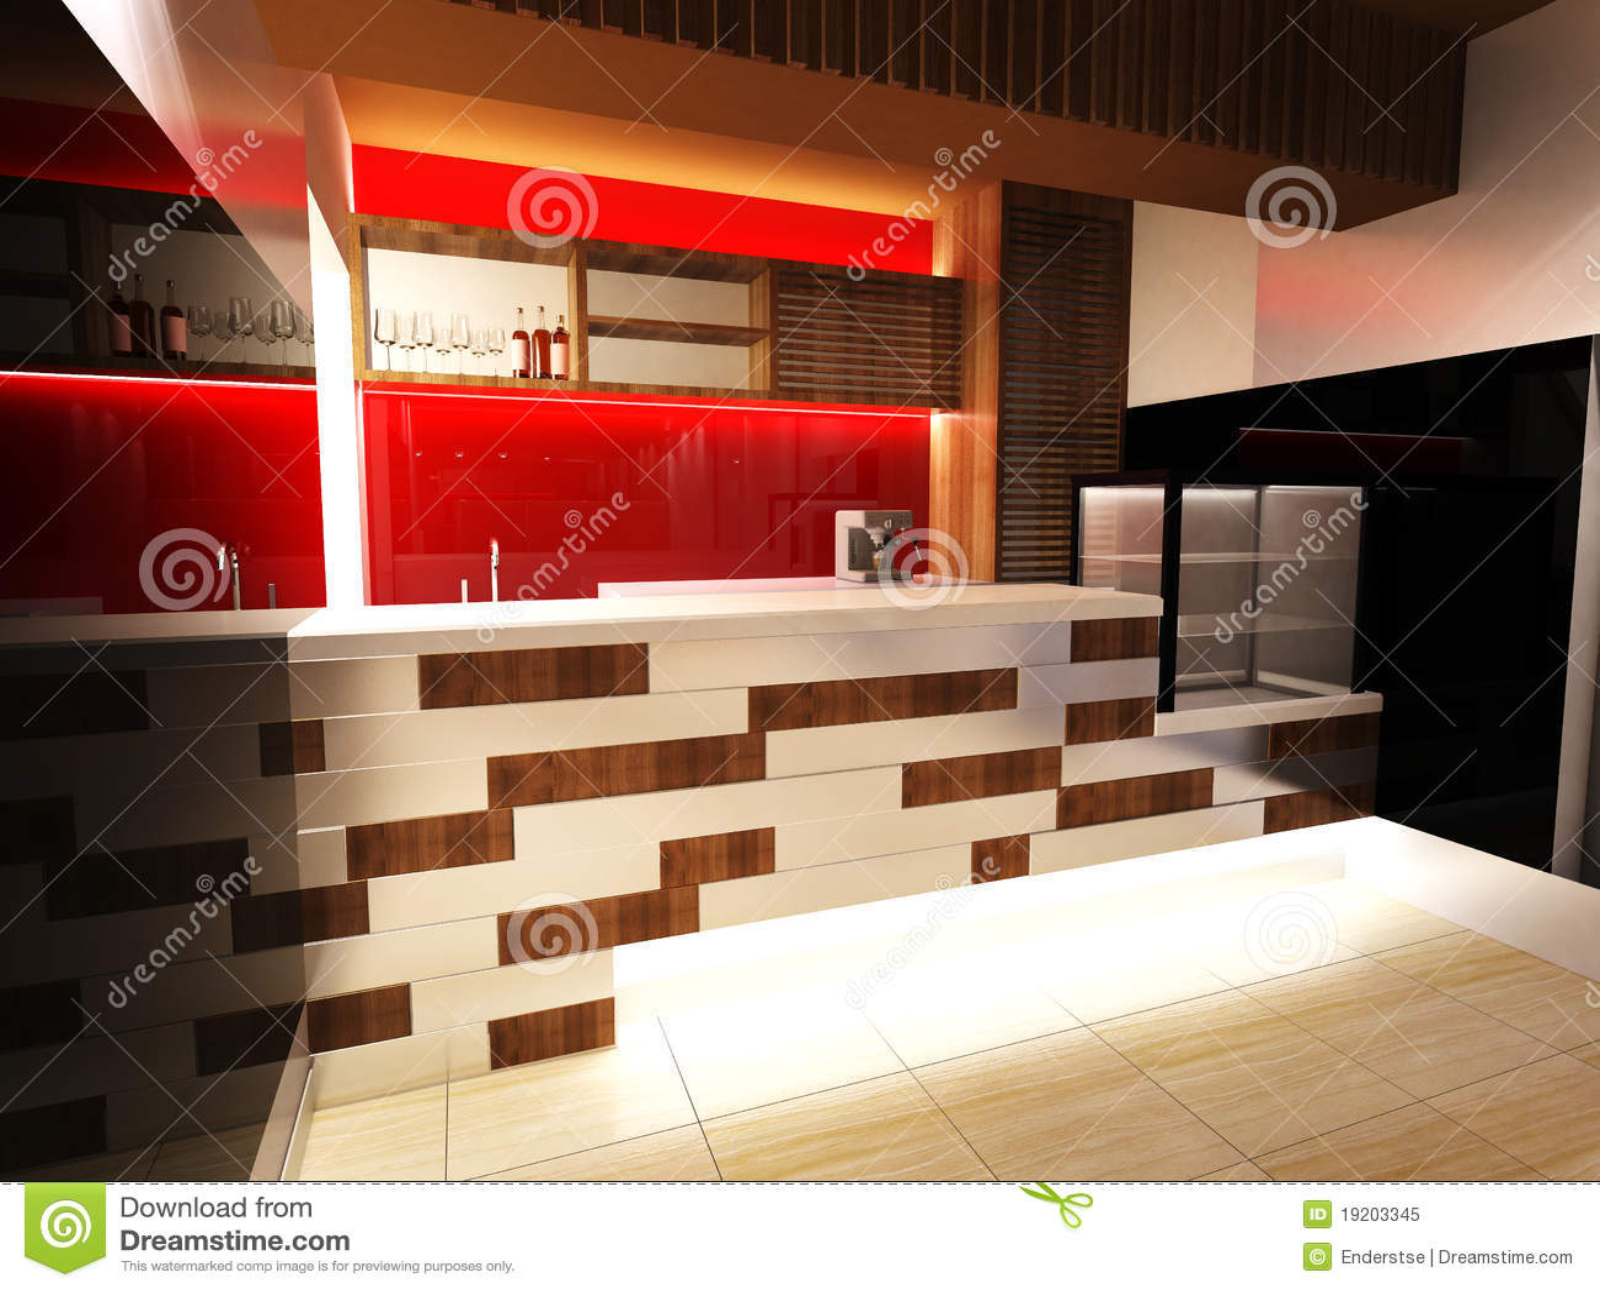 Bar Interior Design Royalty Free Stock Photo Image 19203345